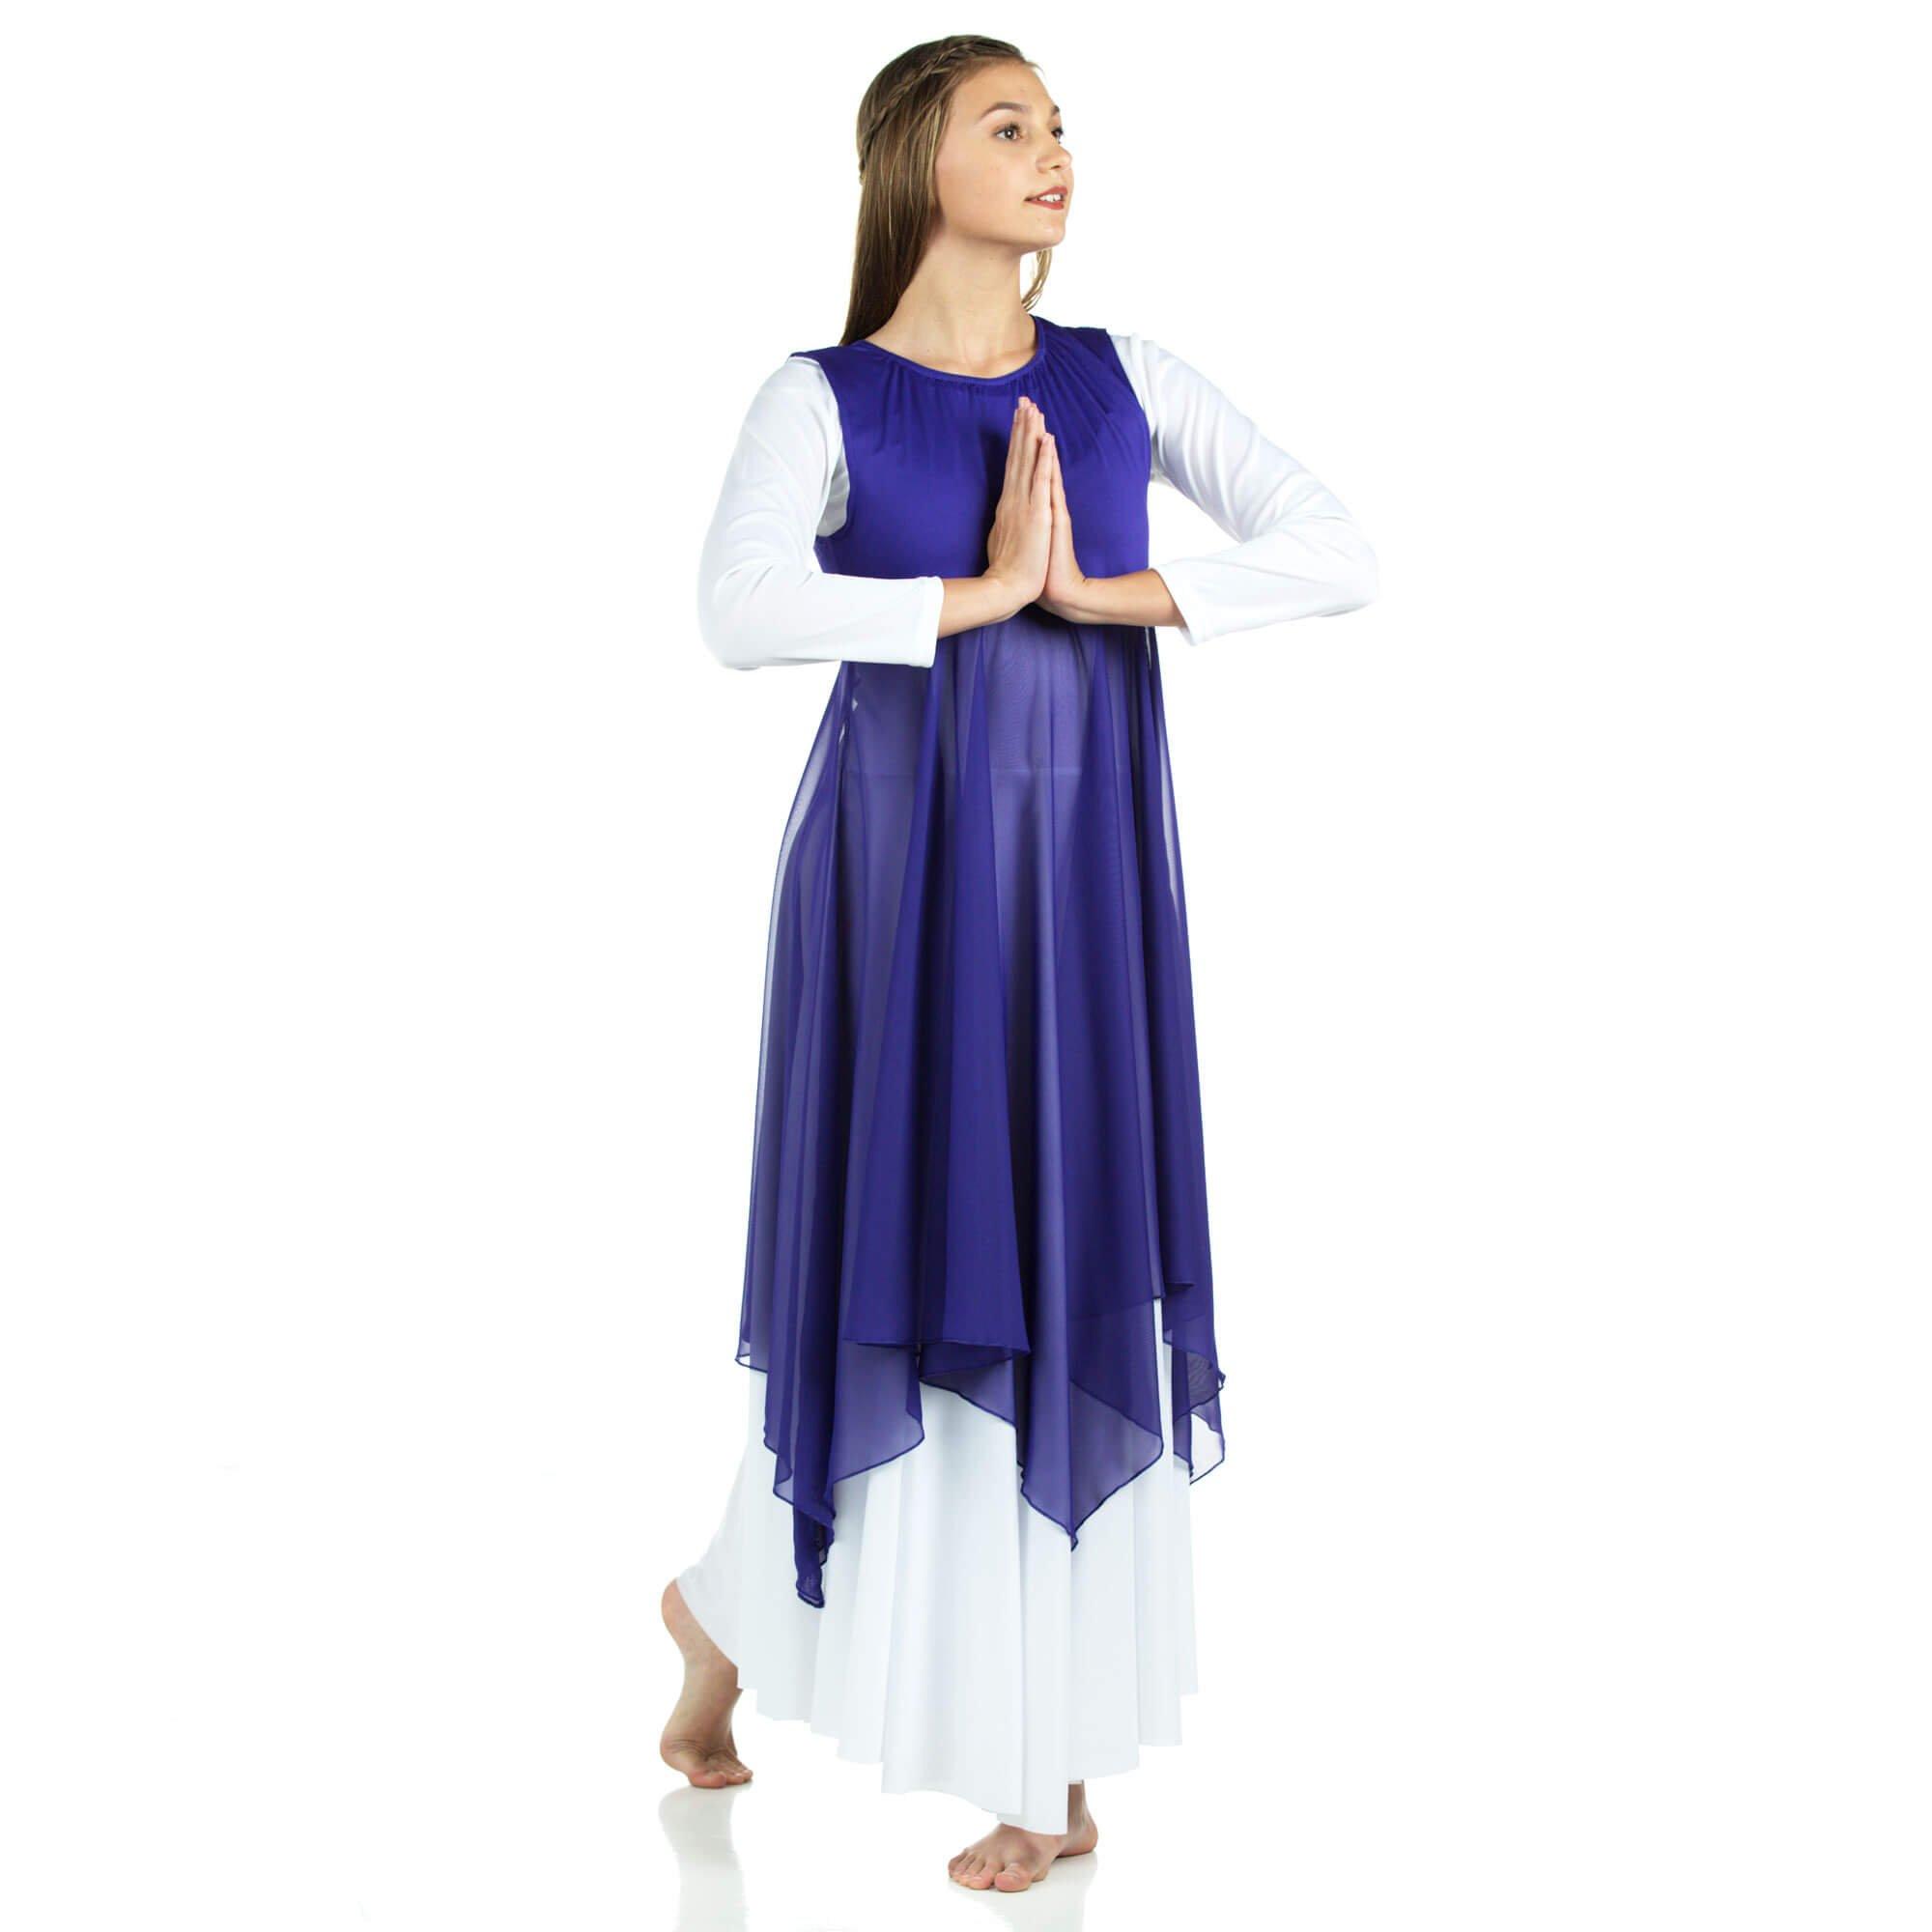 Danzcue Praise Dance Pullover Vest